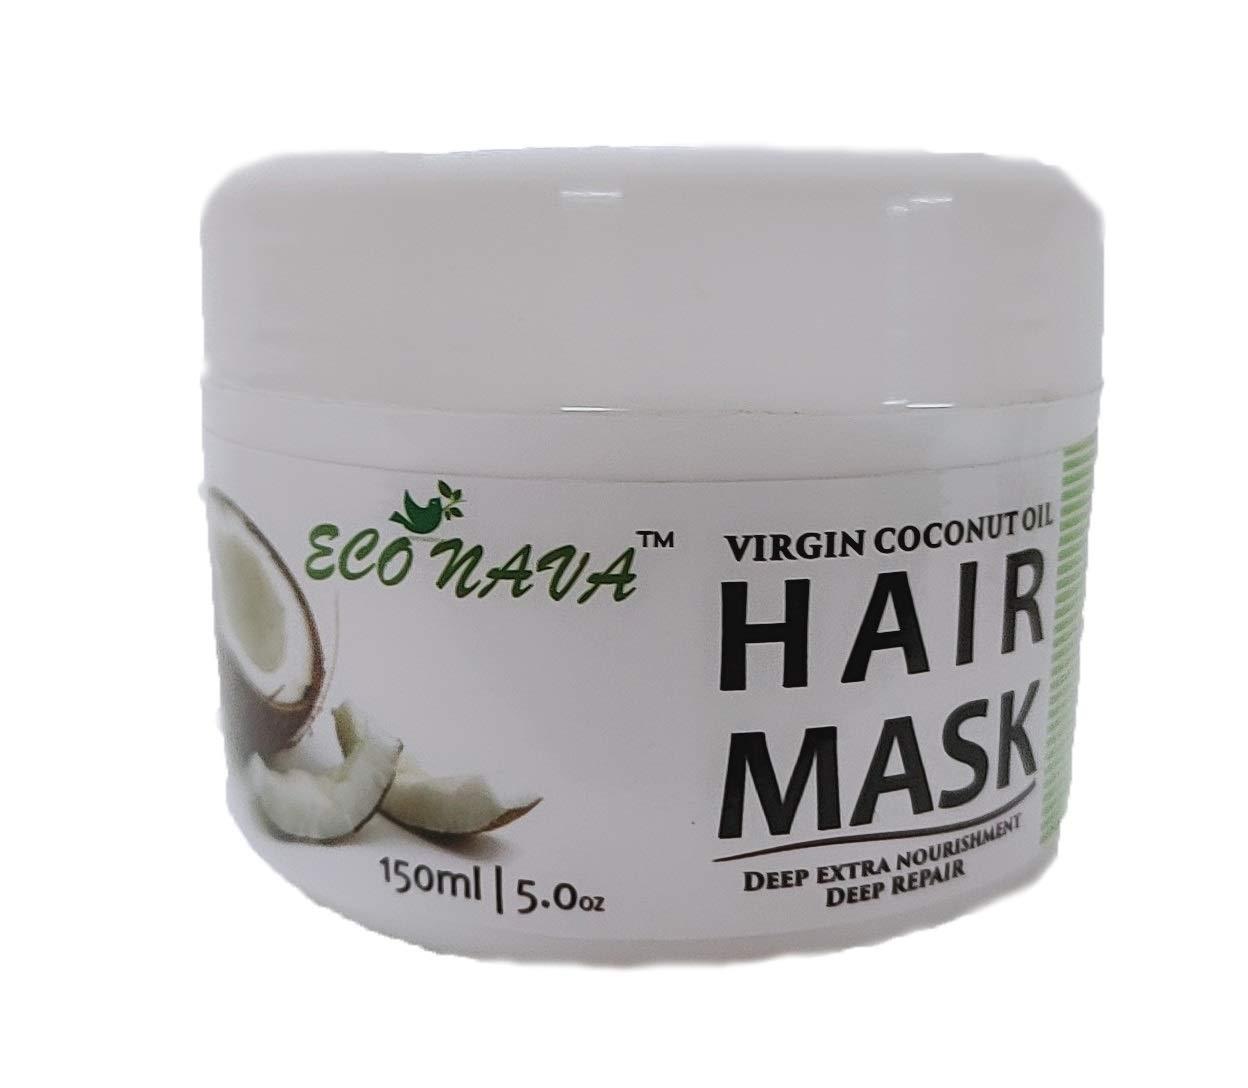 Coconut Hair Mask Cream 200ml Treatment for Damaged & Dry Hair Repair & Growth from Sri Lanka